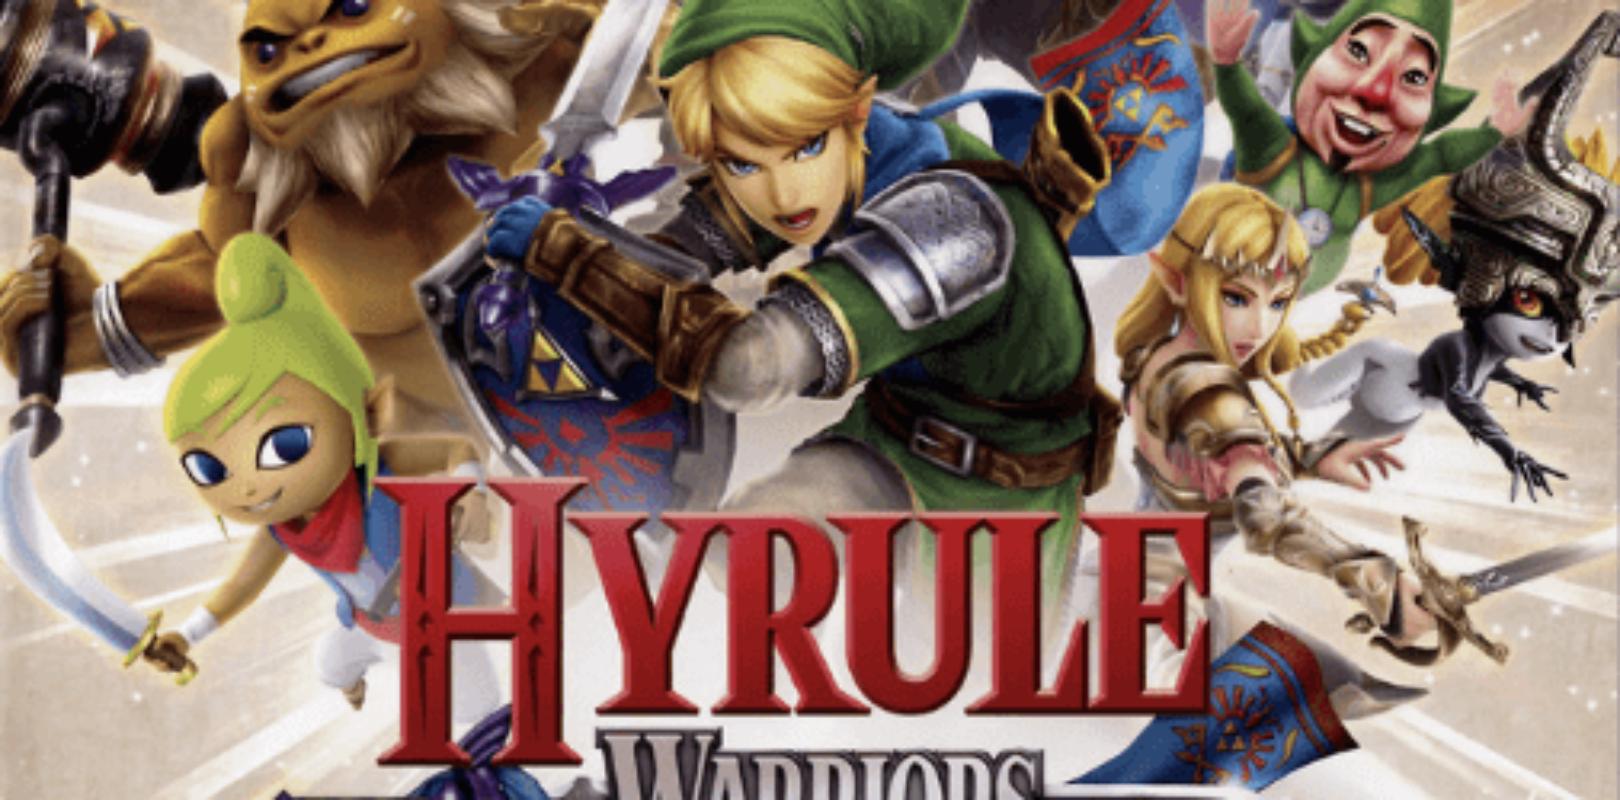 Hyrule Warriors Legends Pc Download Free Crack Console2pc